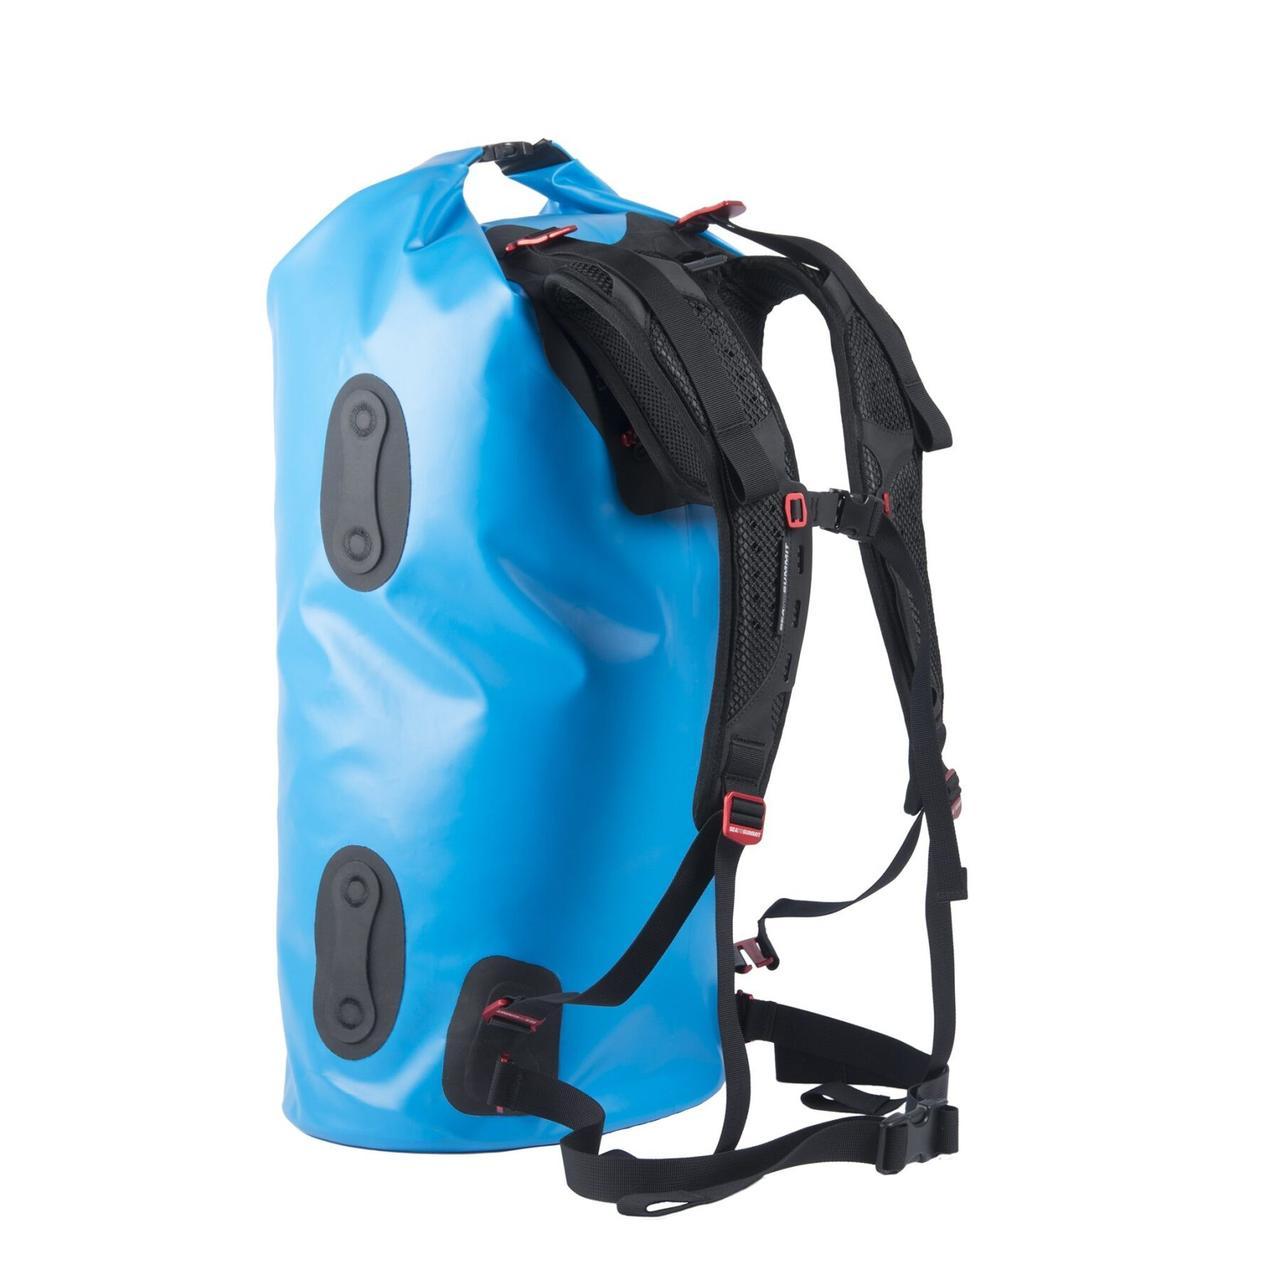 Гермомішок Sea To Summit Hydraulic Dry Pack Harness 90 Blue